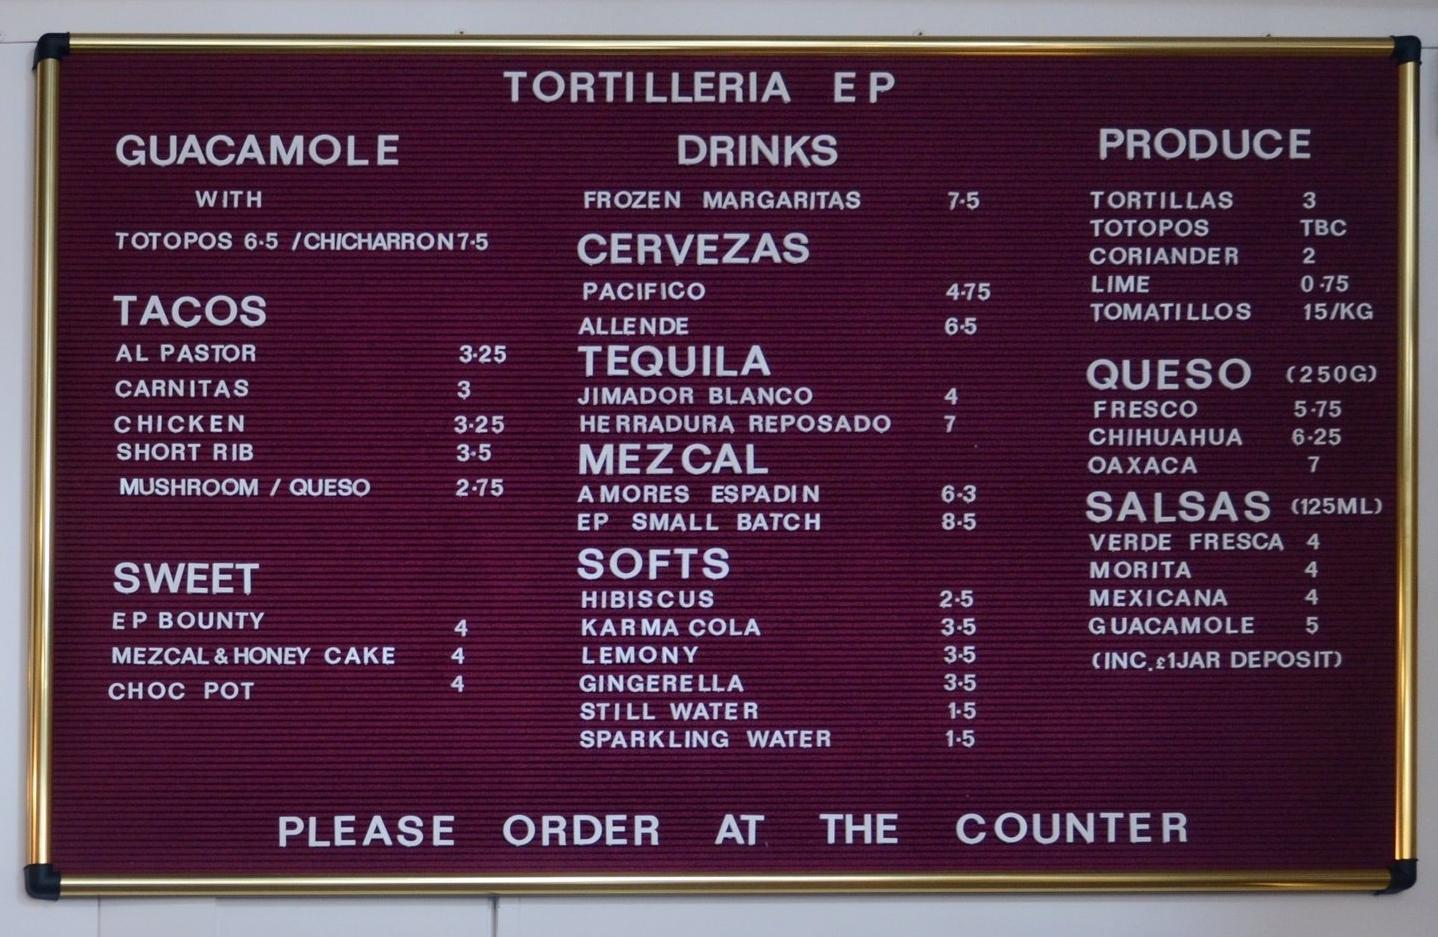 Tortilleria El Pastor